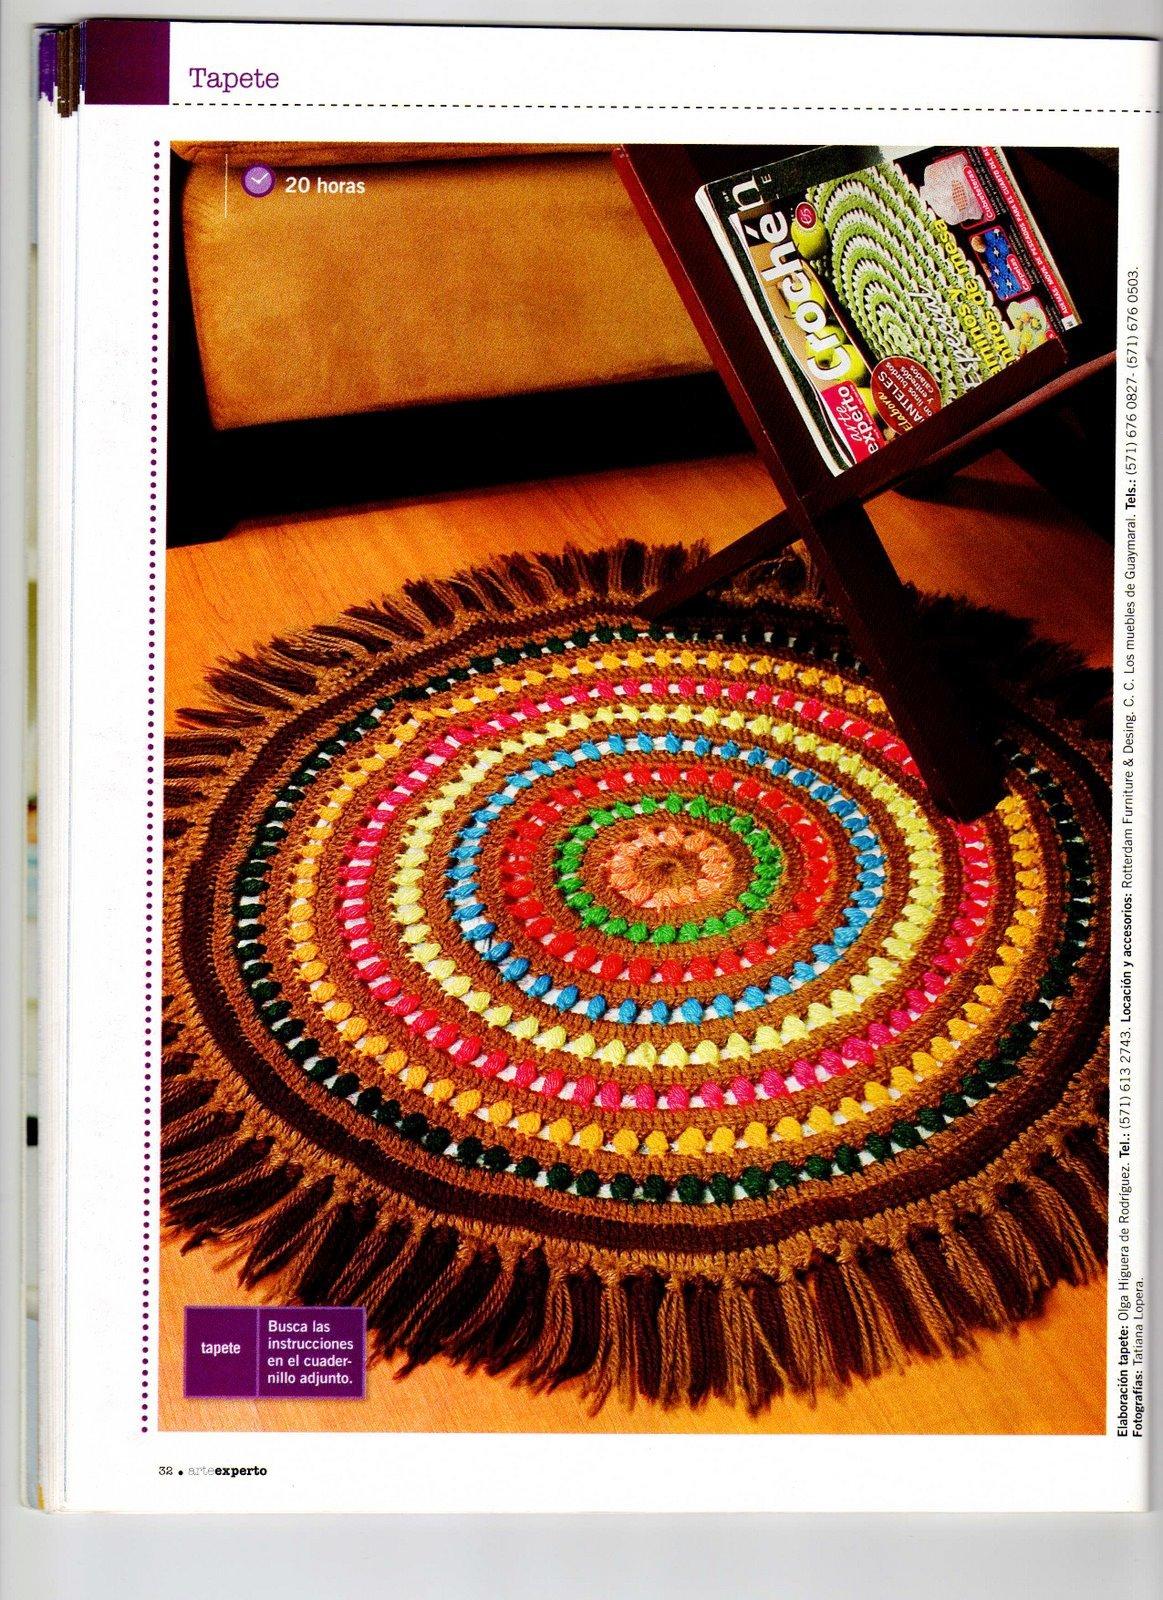 fragmentextos tapete circular com franjas em croch tipo. Black Bedroom Furniture Sets. Home Design Ideas